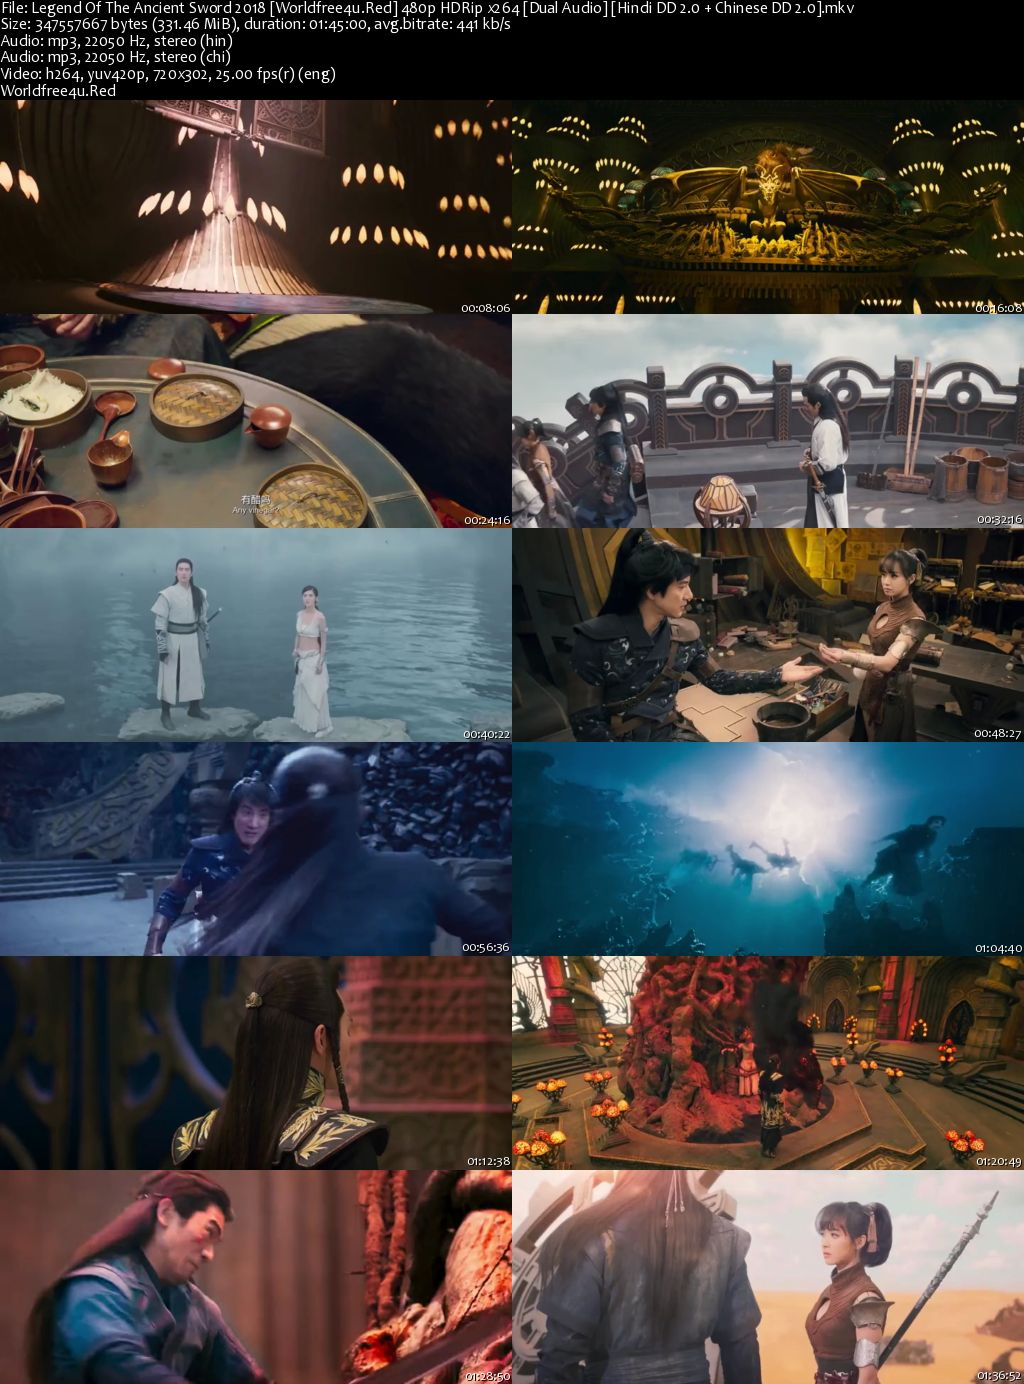 Legend Of The Ancient Sword 2018 HDRip 480p Dual Audio 300Mb